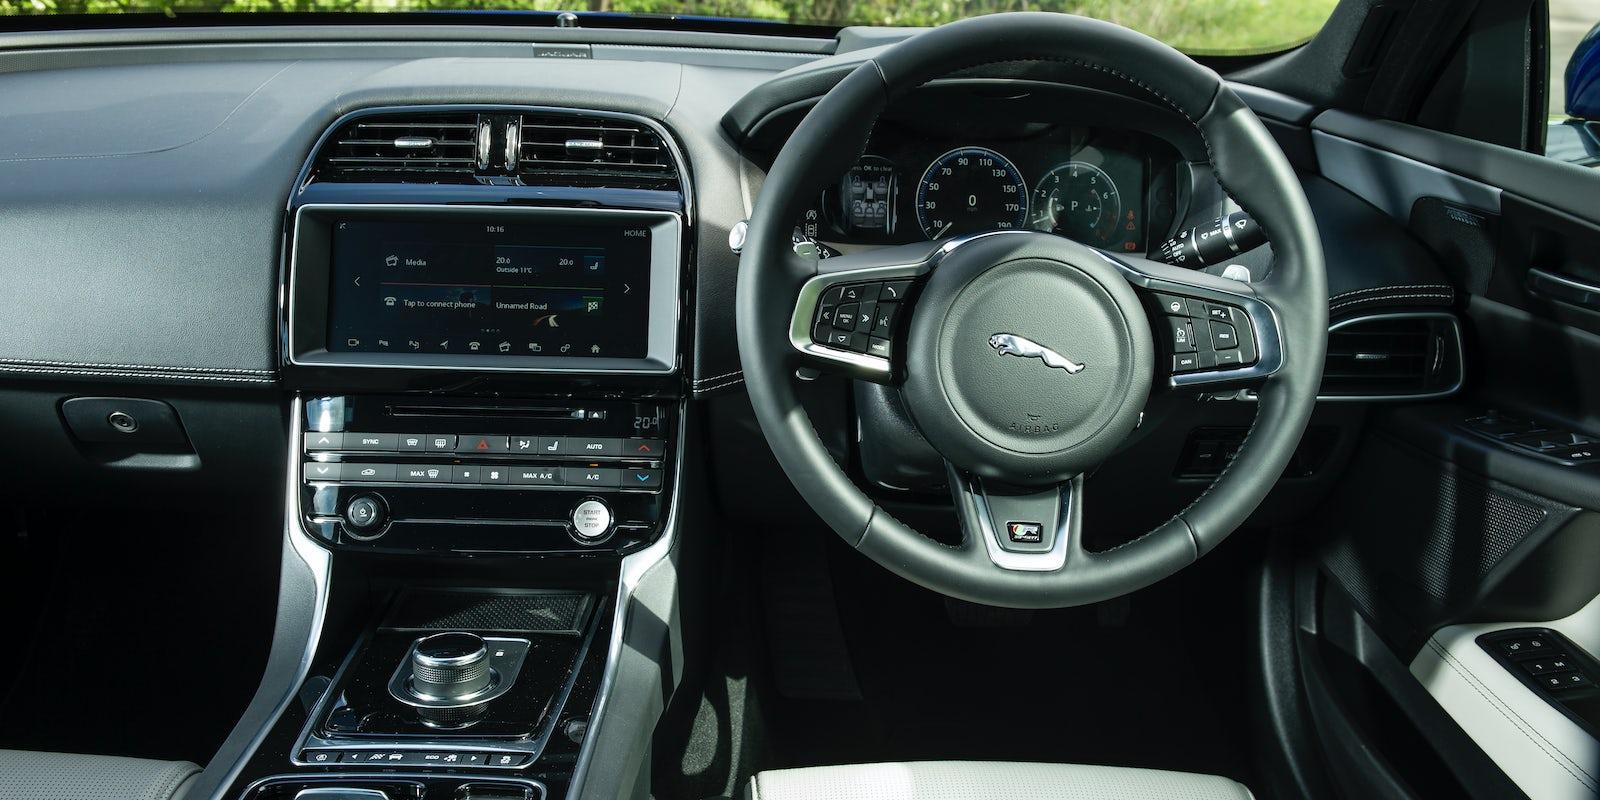 Used Range Rover Sport >> Jaguar XE Interior & Infotainment | carwow